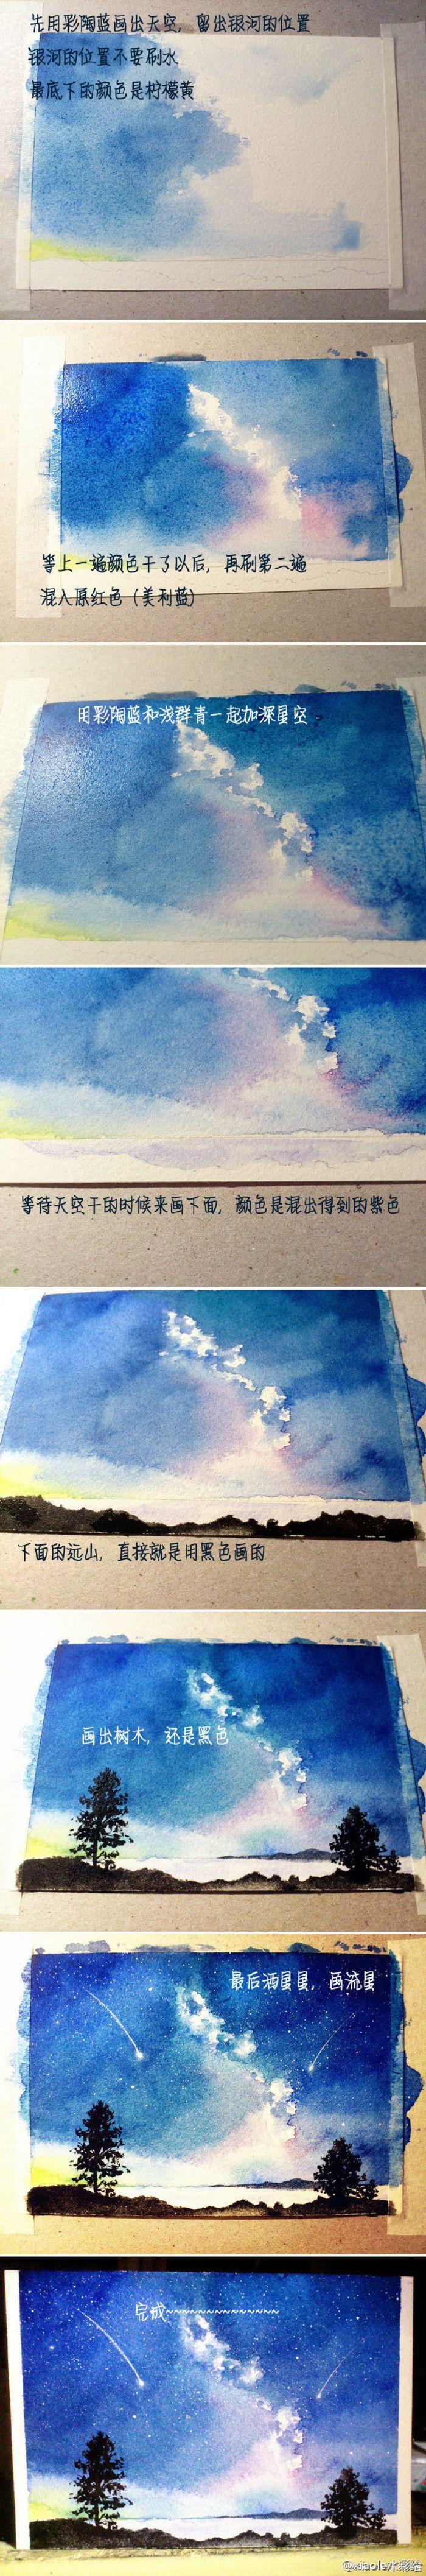 银河の光芒--天空 微博:xiaole水彩绘